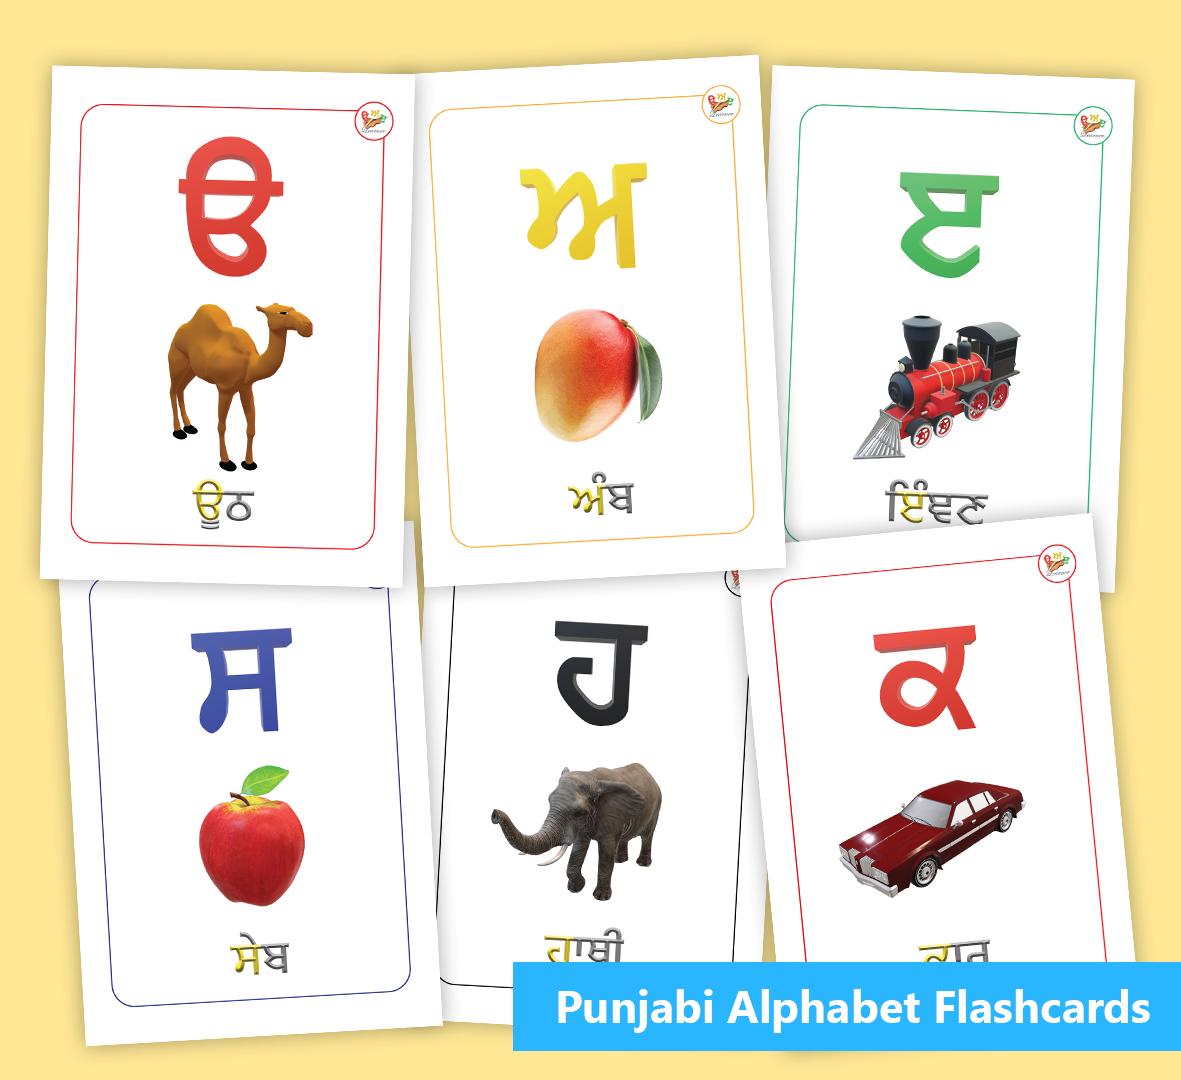 Punjabi Alphabet Flashcards Alphabet Flashcards Flashcards Alphabet [ 1080 x 1181 Pixel ]